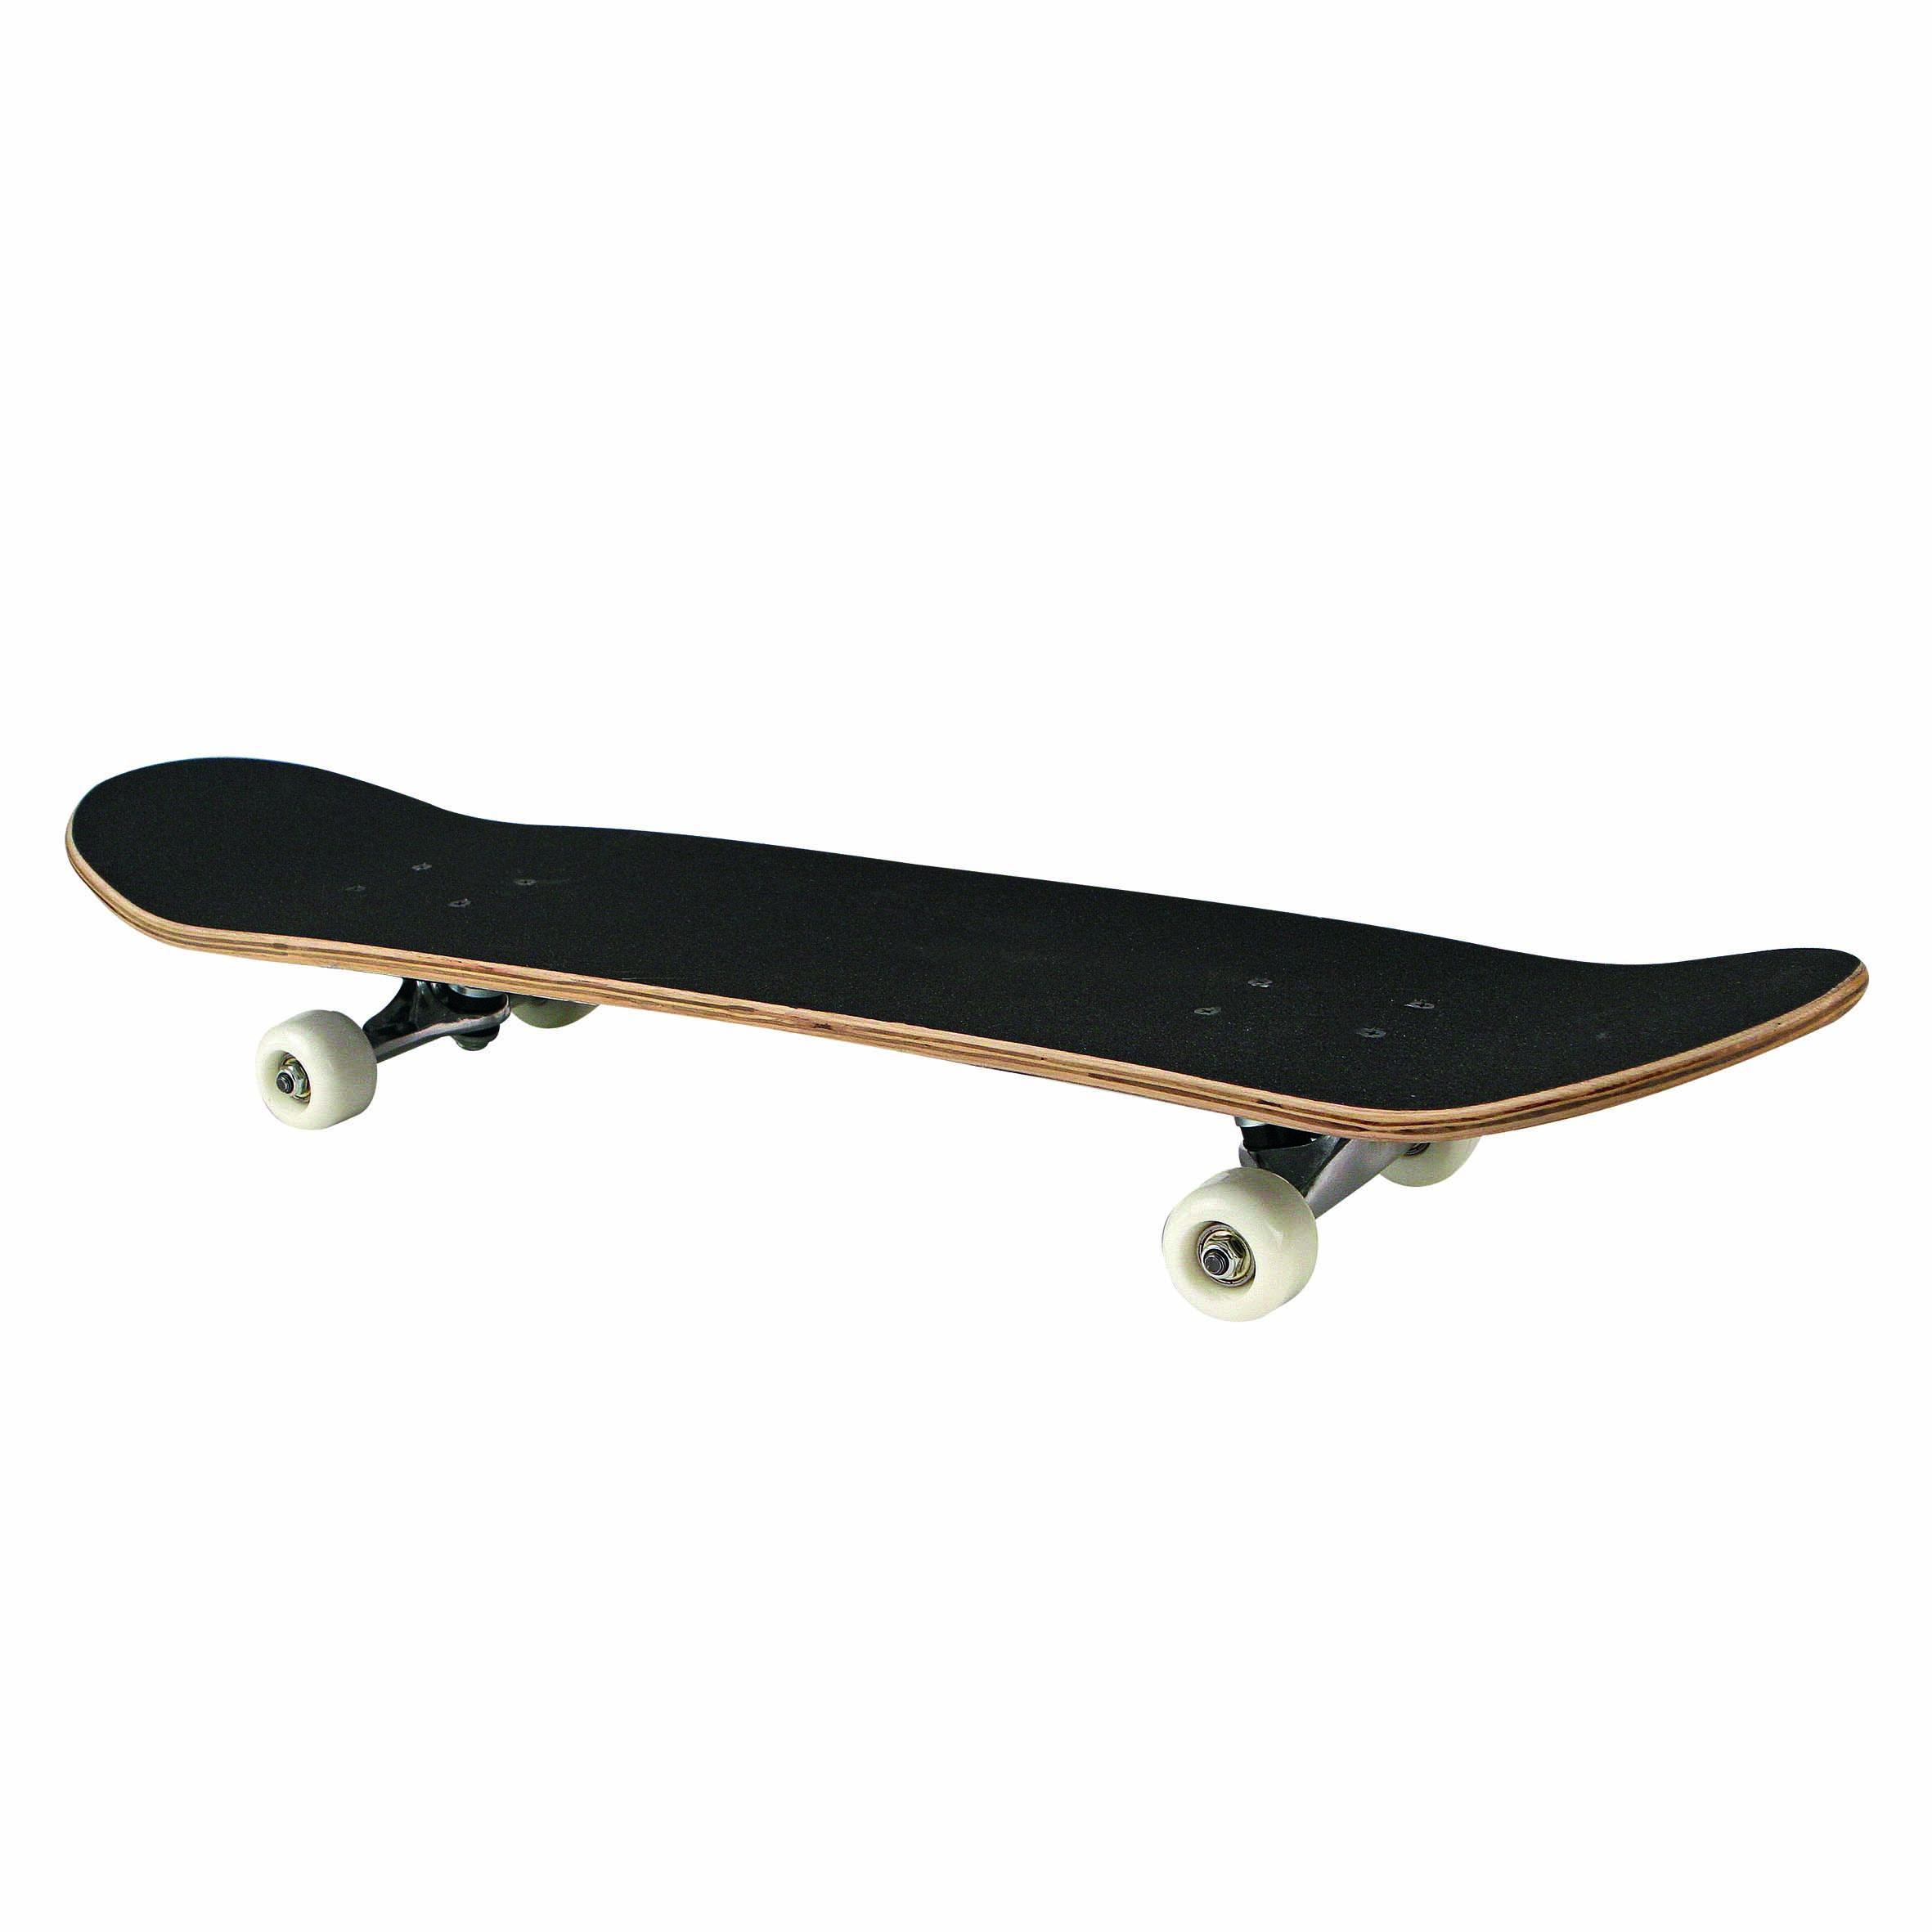 Afbeelding van Skateboard 76 Cm ABEC 5 Alert